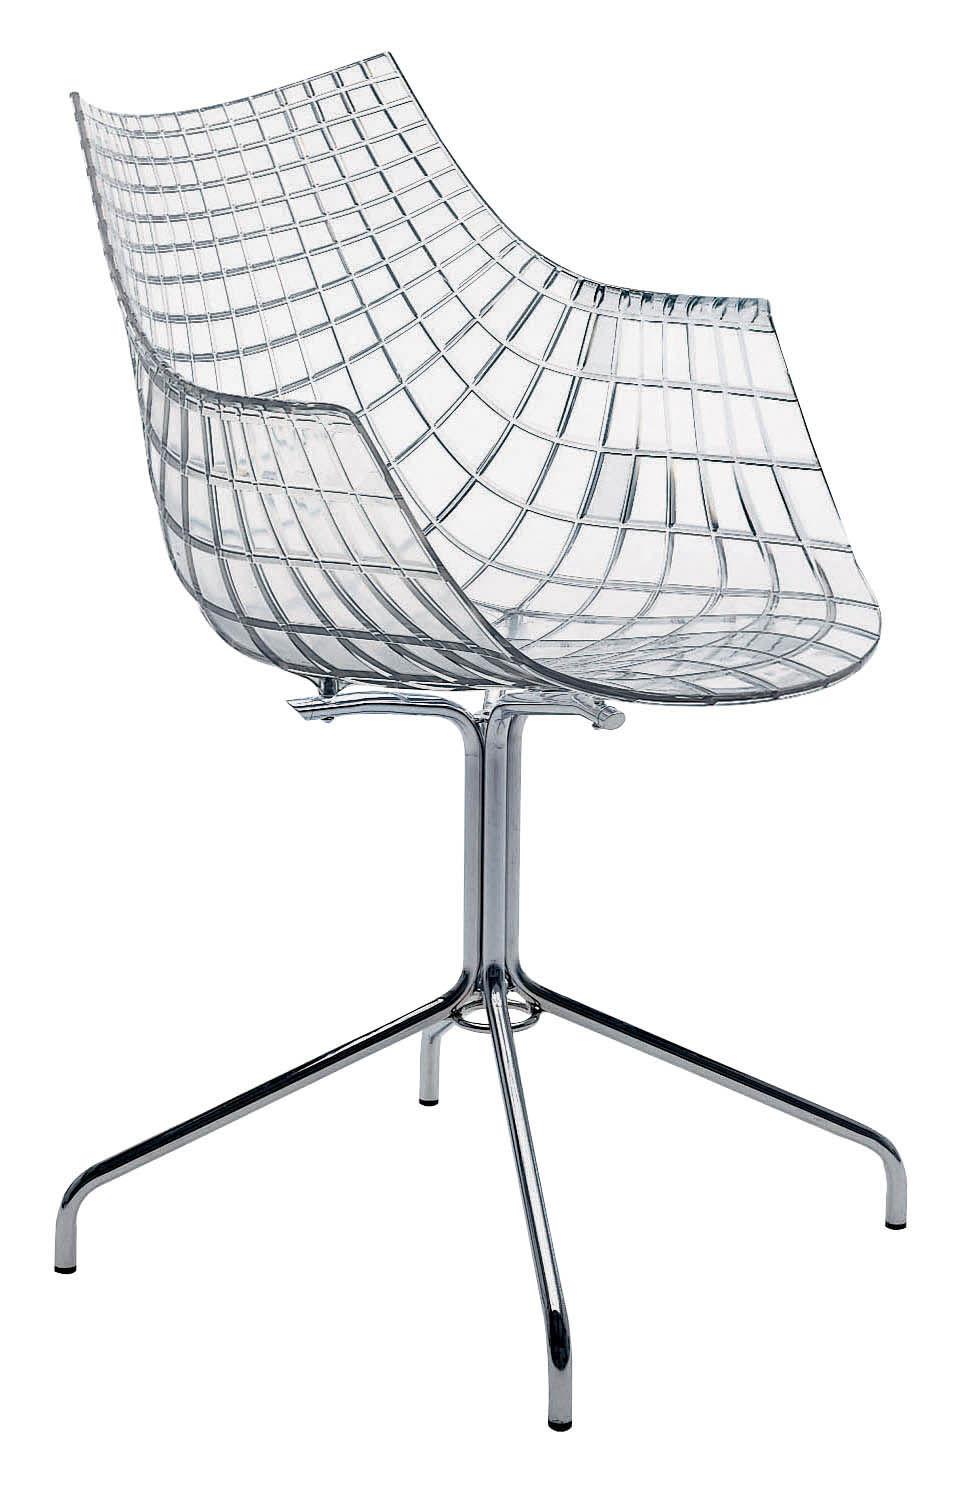 Möbel - Stühle  - Meridiana Sessel - Driade - Transparent - Polykarbonat, verchromter Stahl